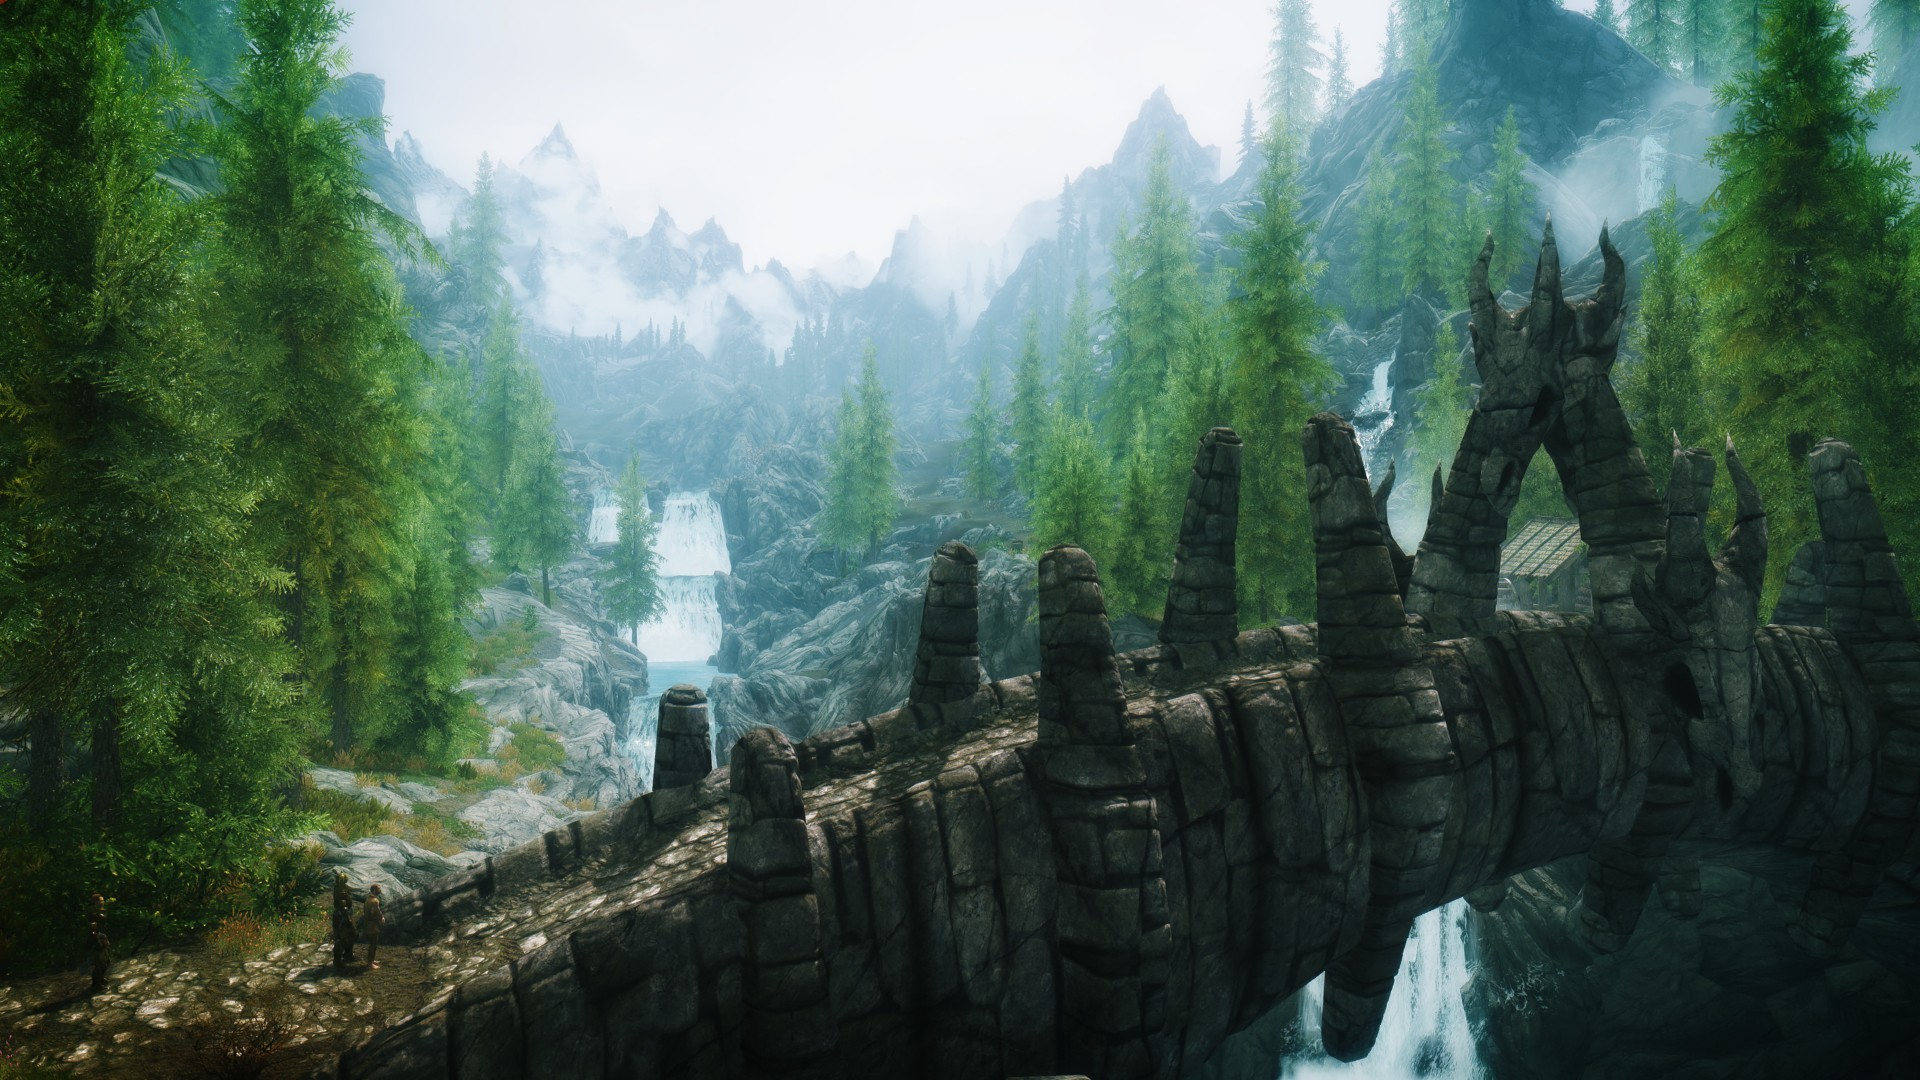 Skyrim Wallpaper HD Source: https://wall.alphacoders.com/   The Elder  Scrolls: Skyrim   Pinterest   Wallpapers and Skyrim